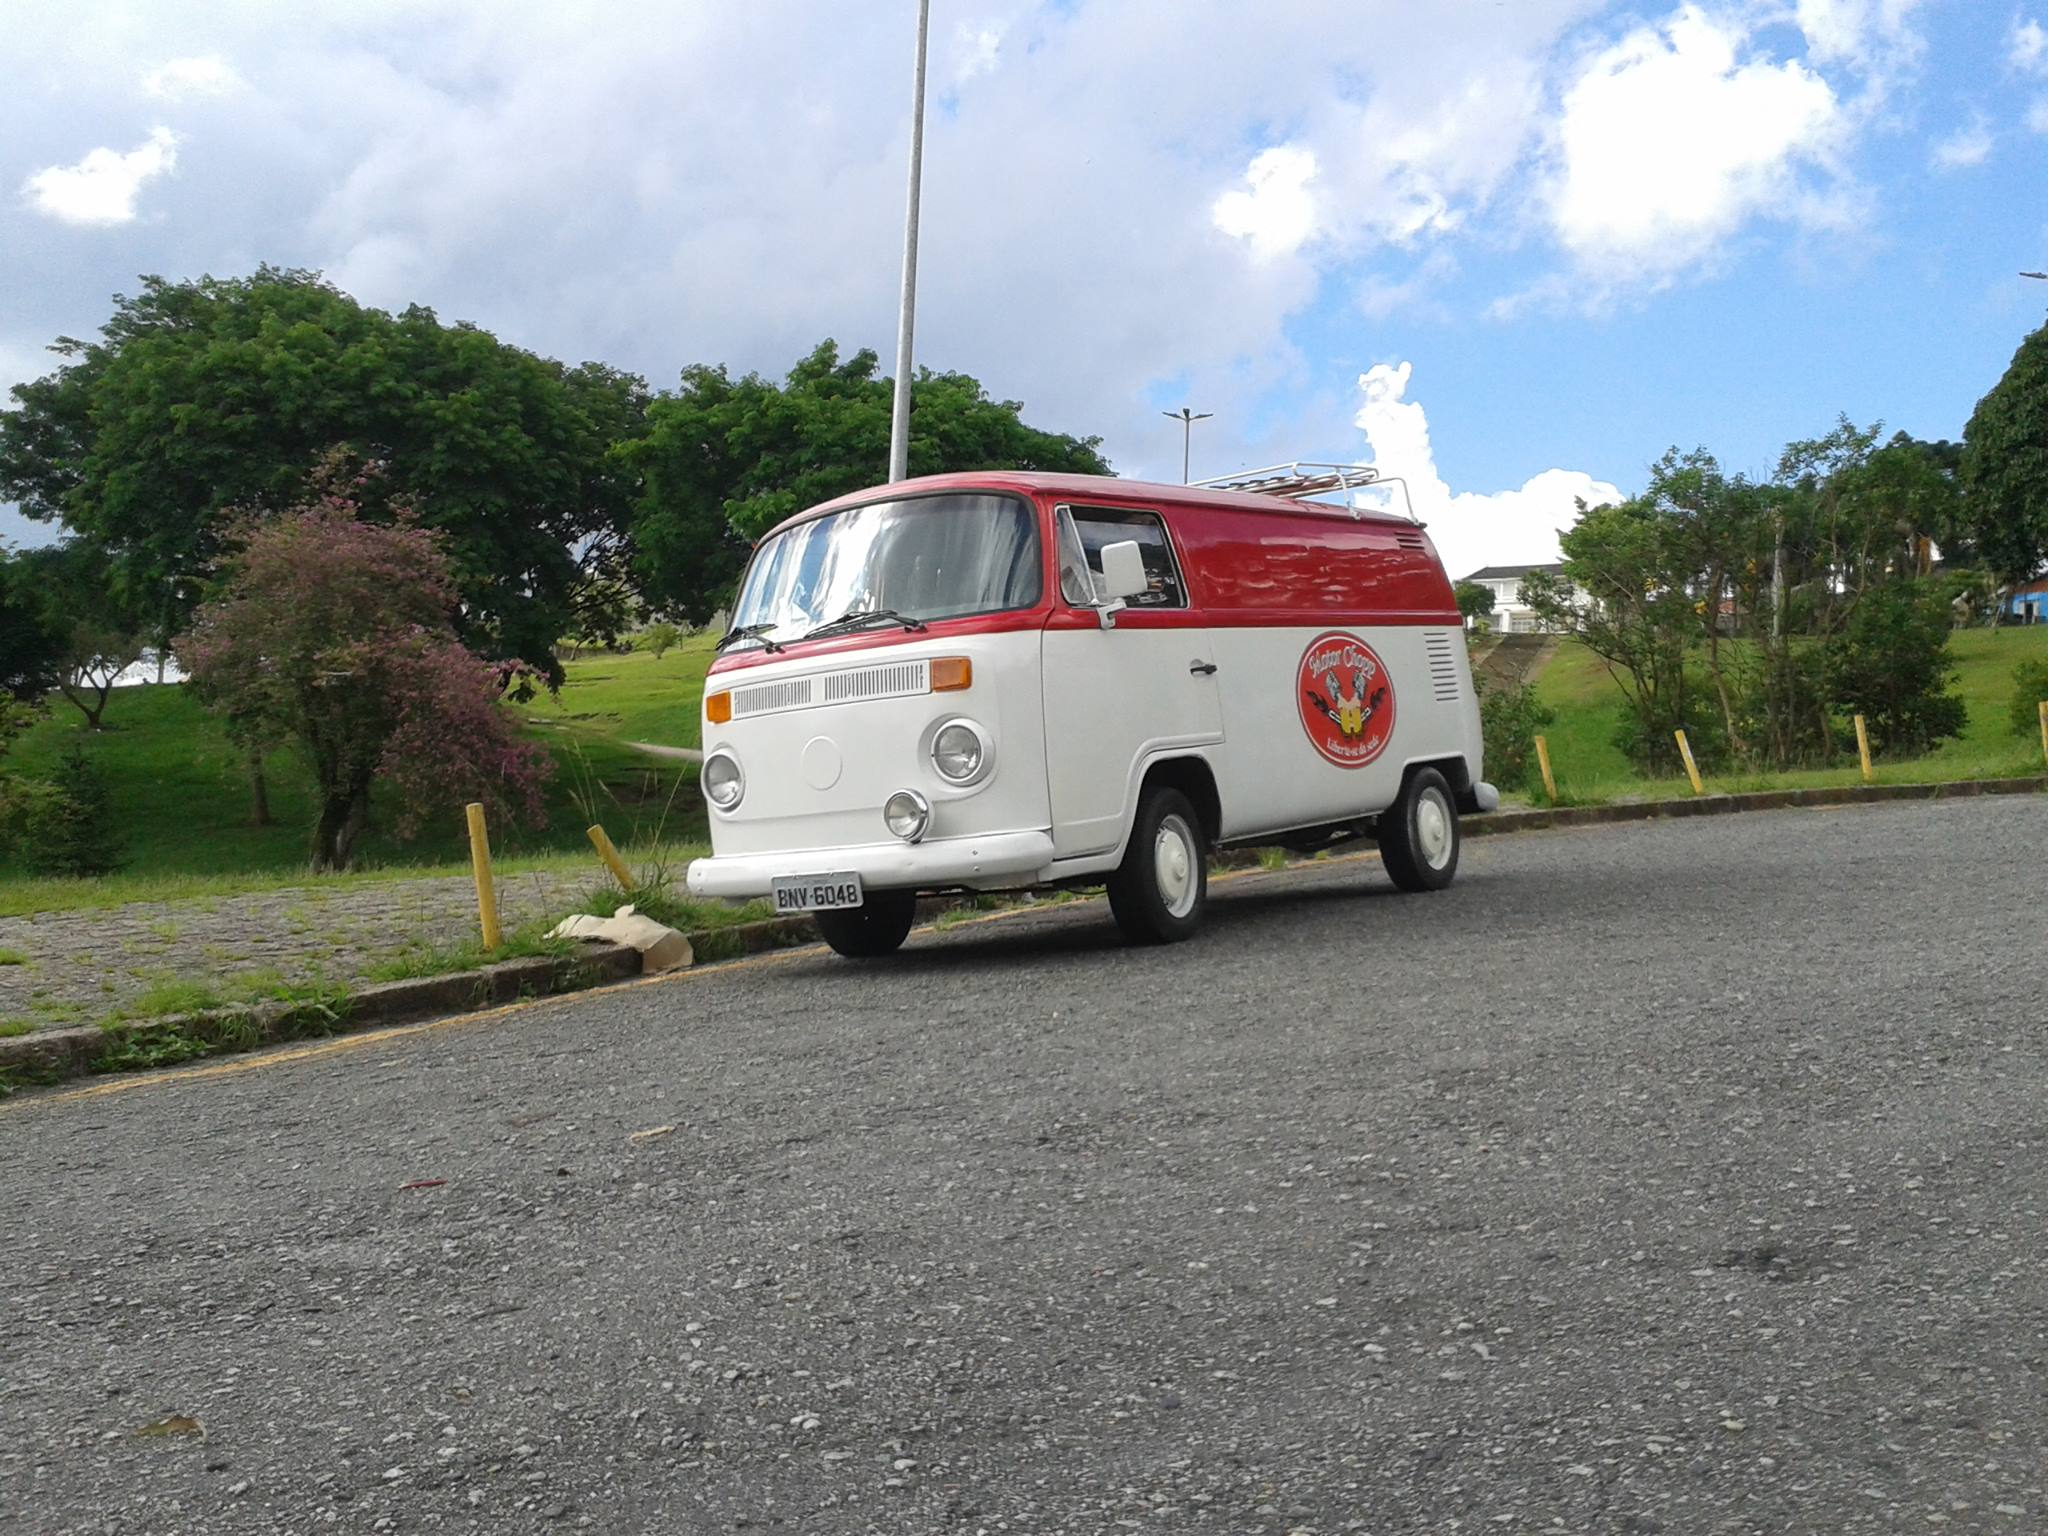 beer-truck-mottor-chopp